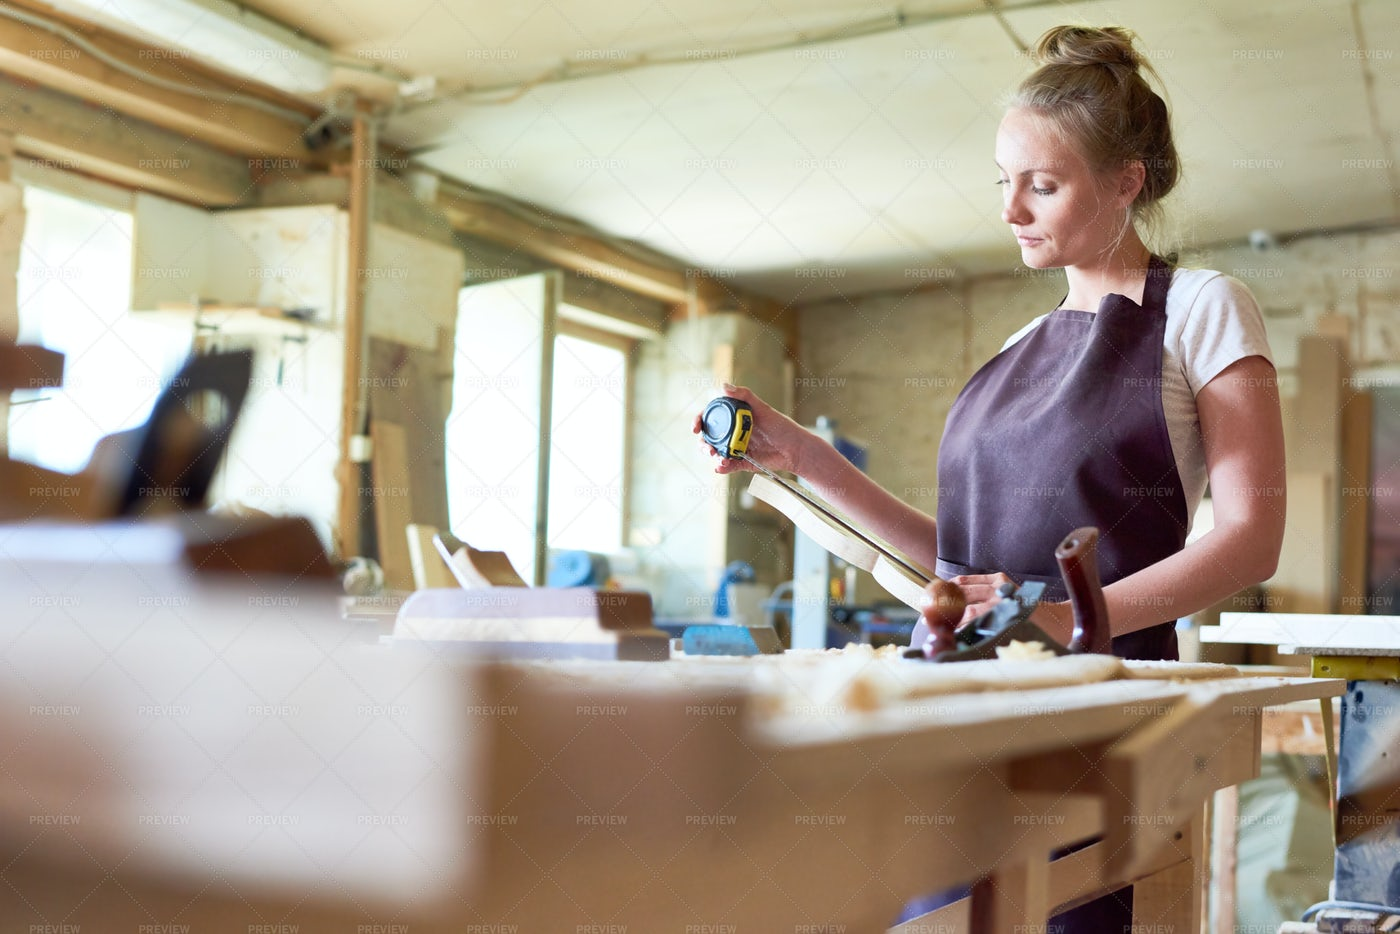 Female Carpenter Working In Shop: Stock Photos